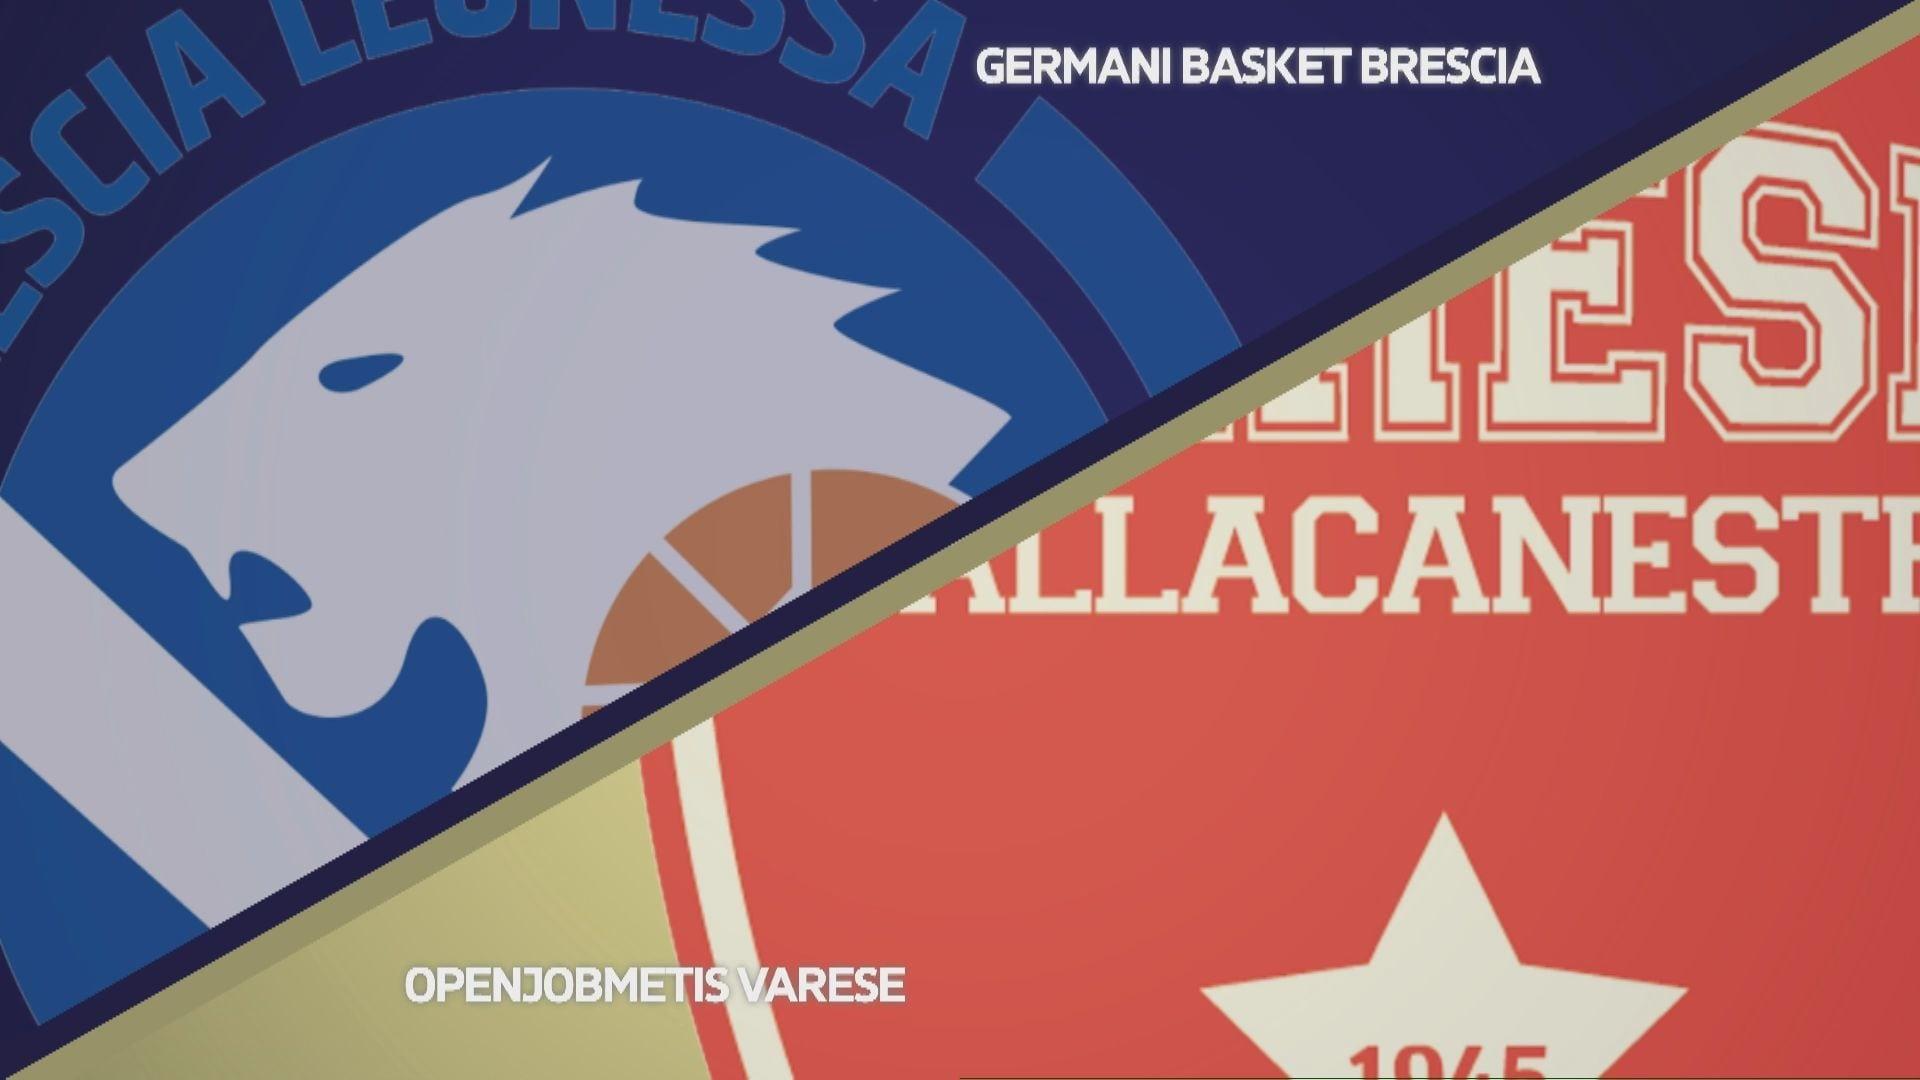 Germani Basket Brescia - Openjobmetis Varese 91-74